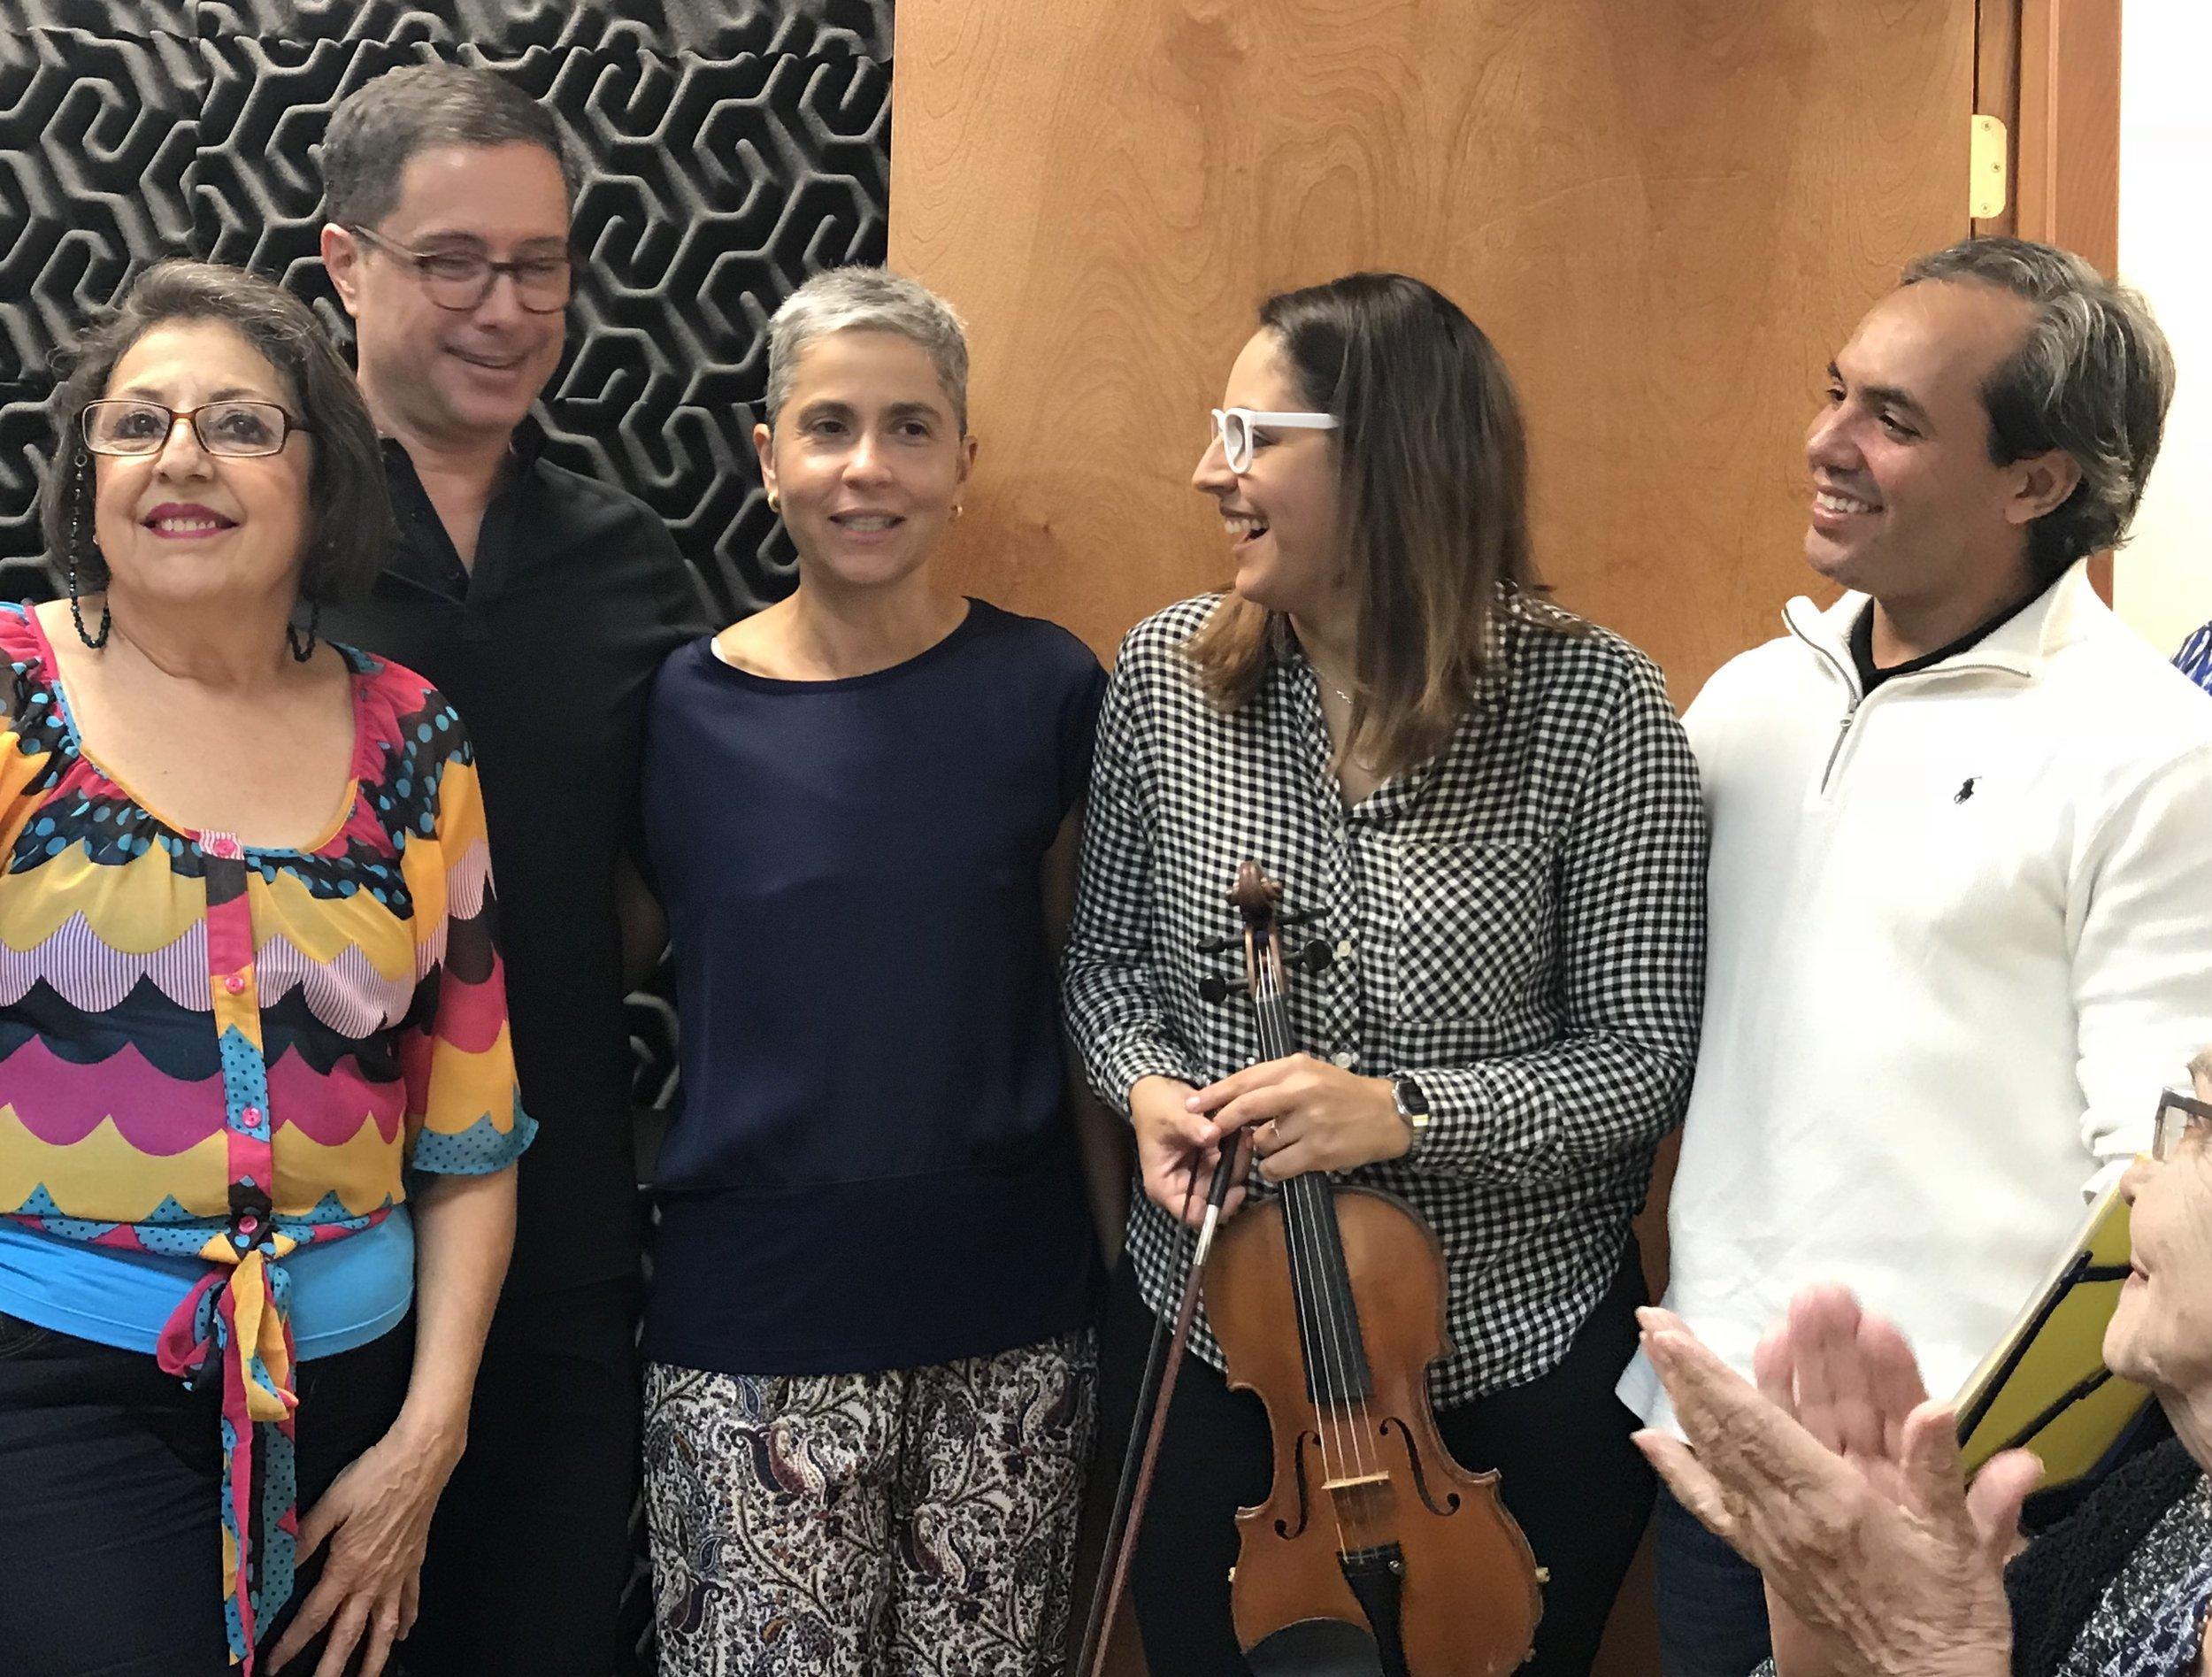 Surrounded by pianists: Olga López, Alejandro Méndez, Mariella Guillén and Simón Molina, after our recital.